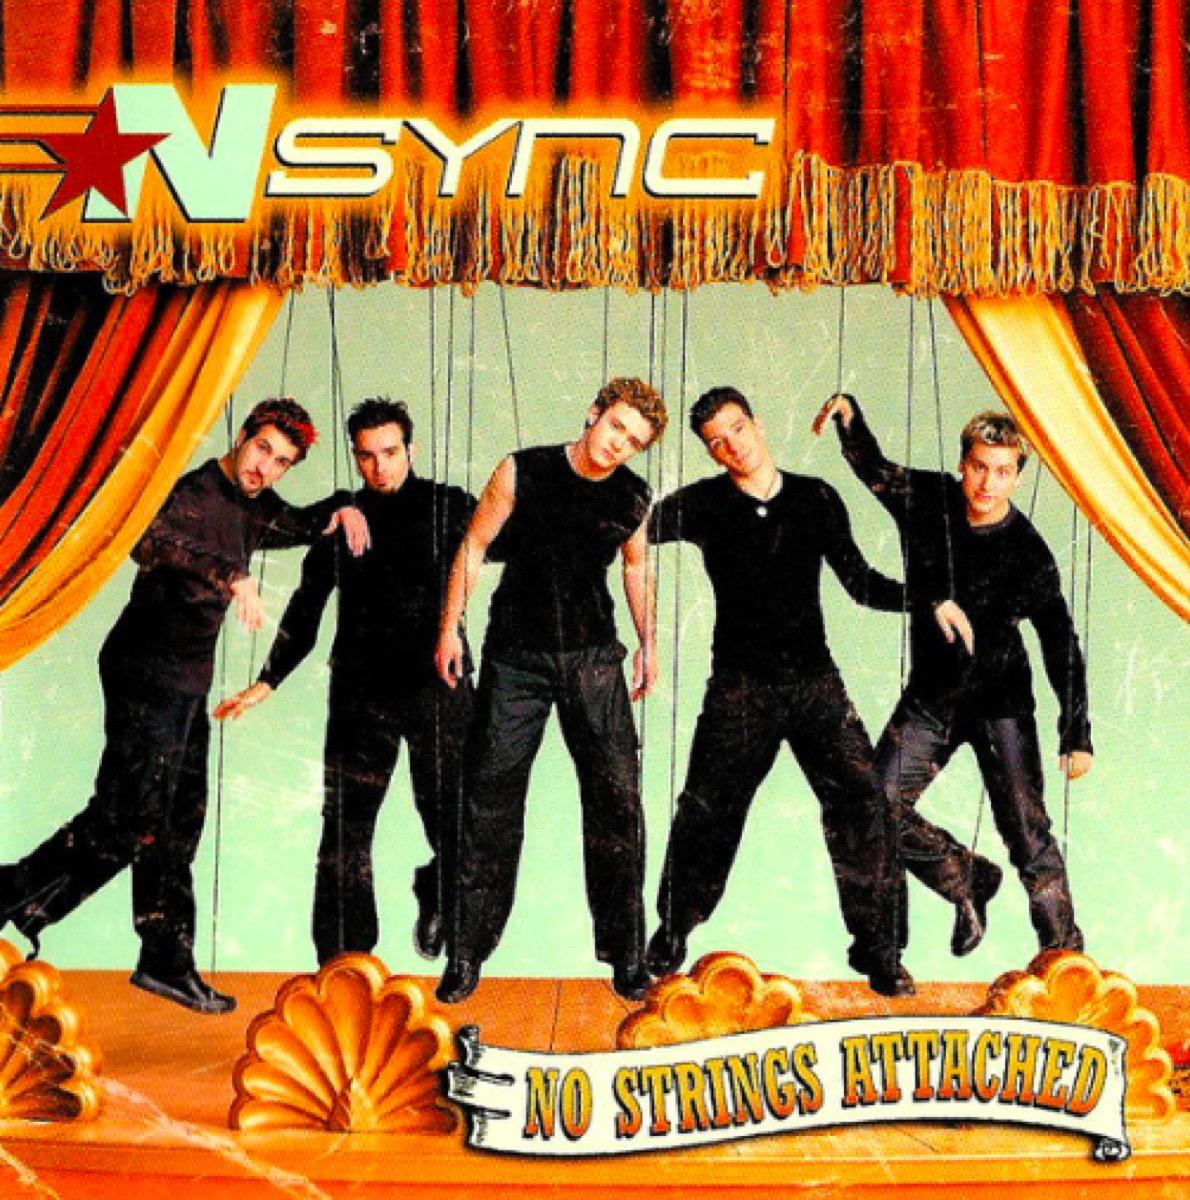 No Strings Attached album *NSYNC